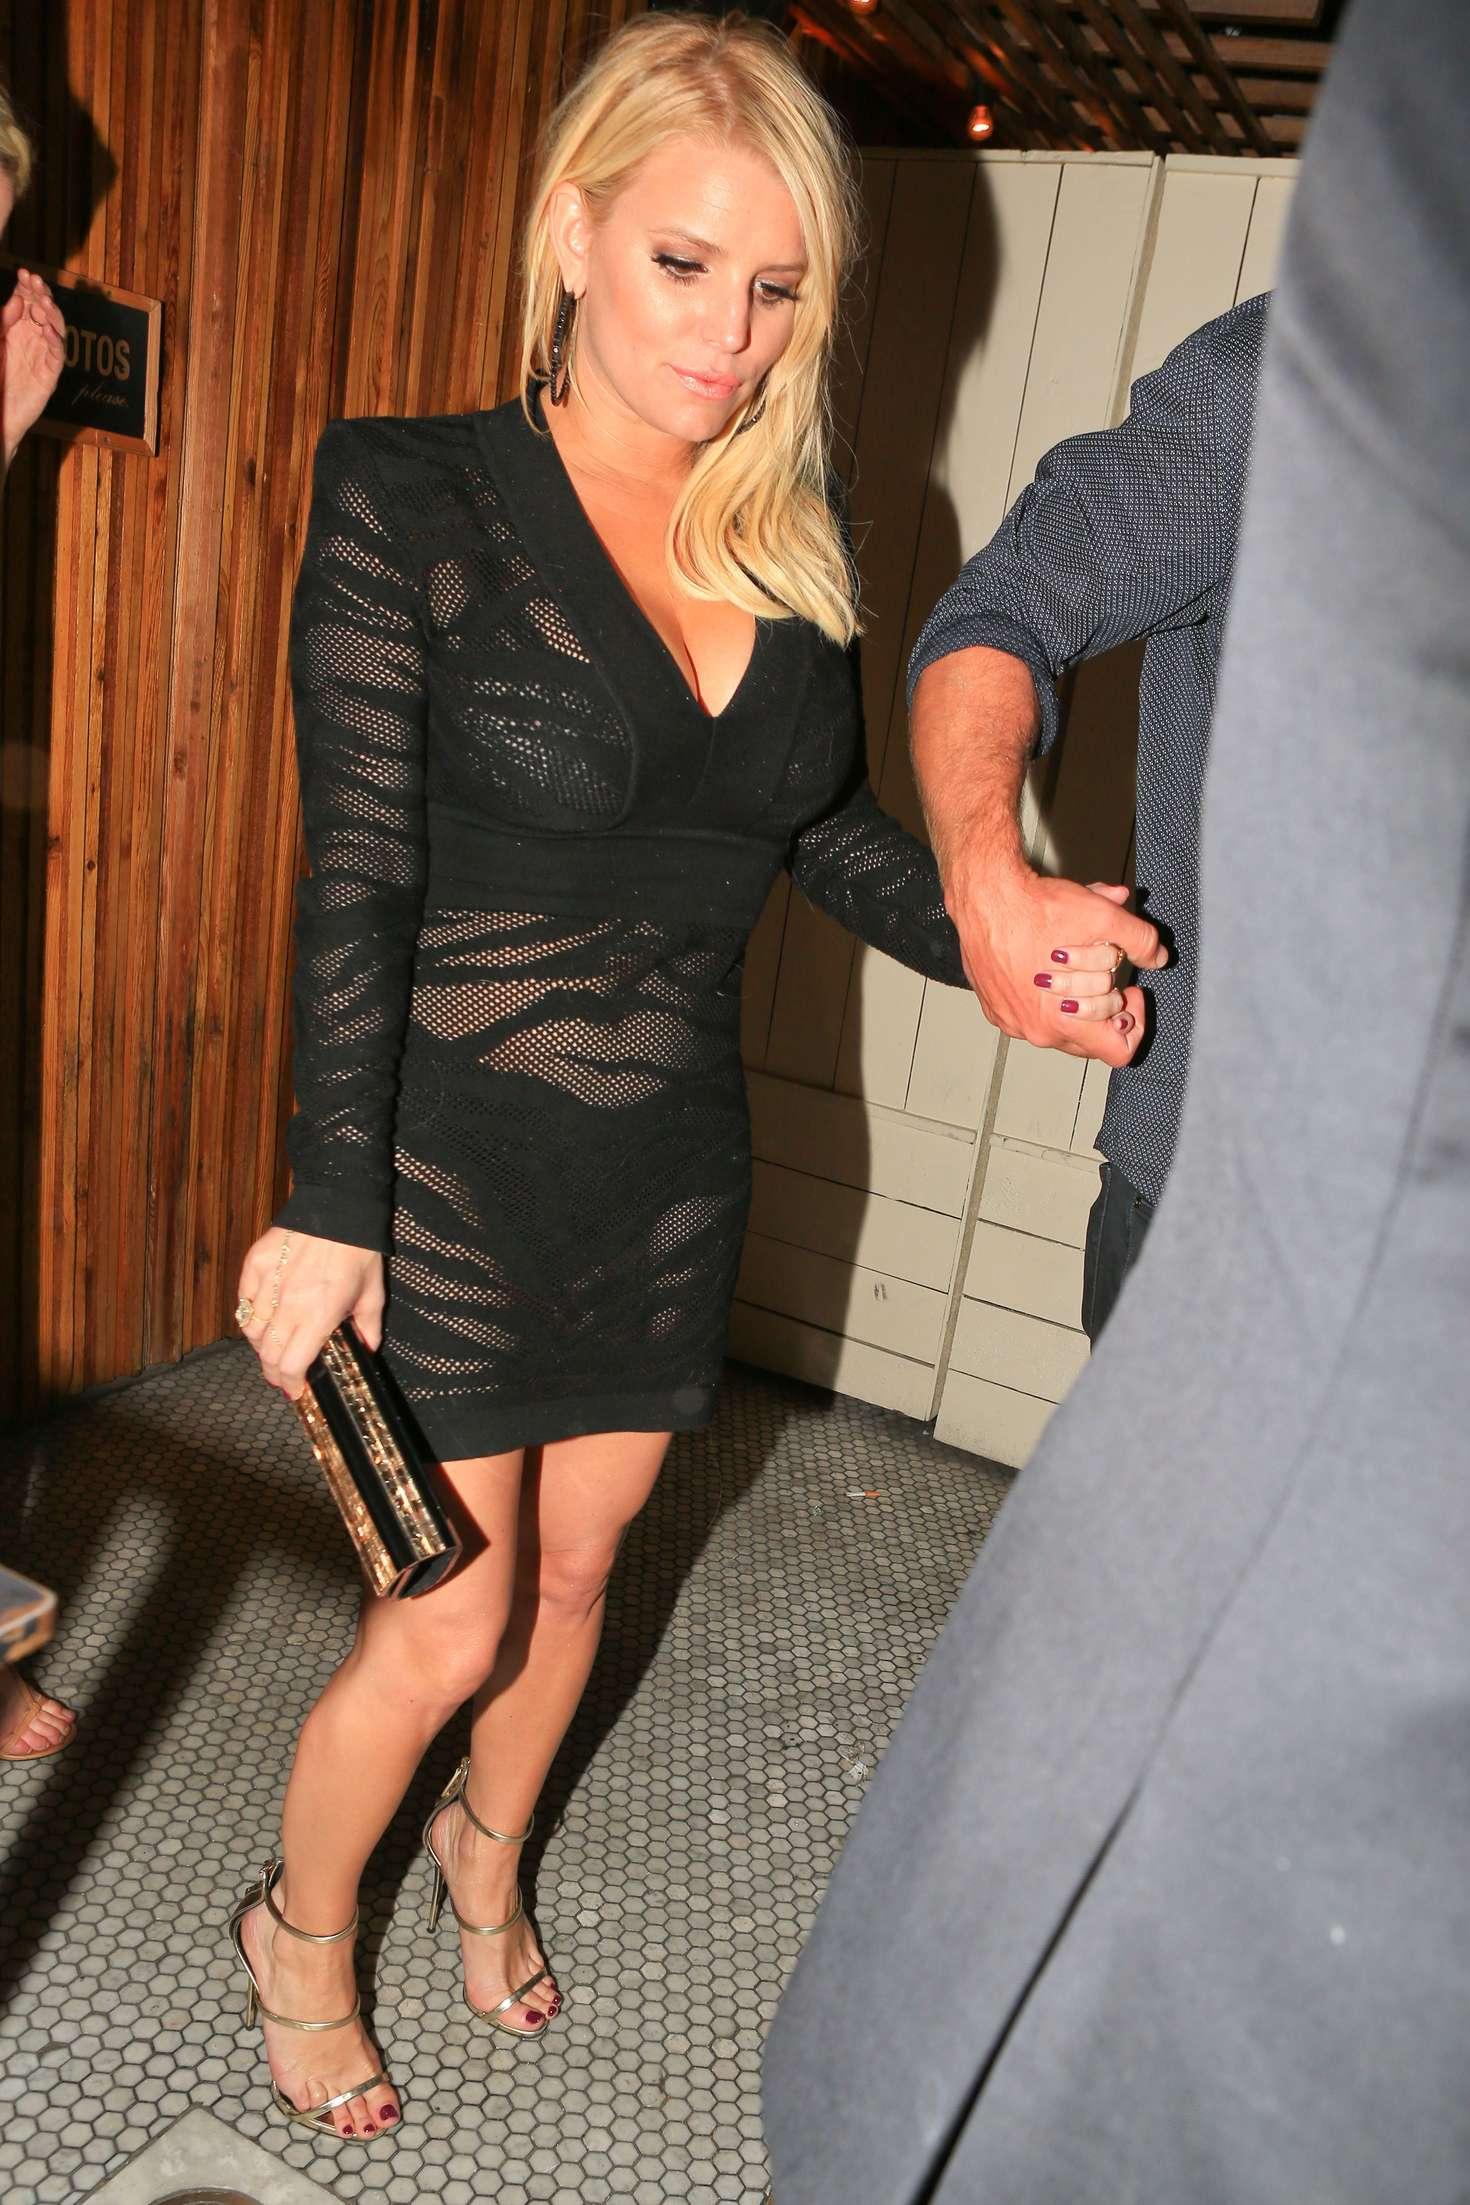 Jessica Simpson in Black Mini Dress -08 - GotCeleb